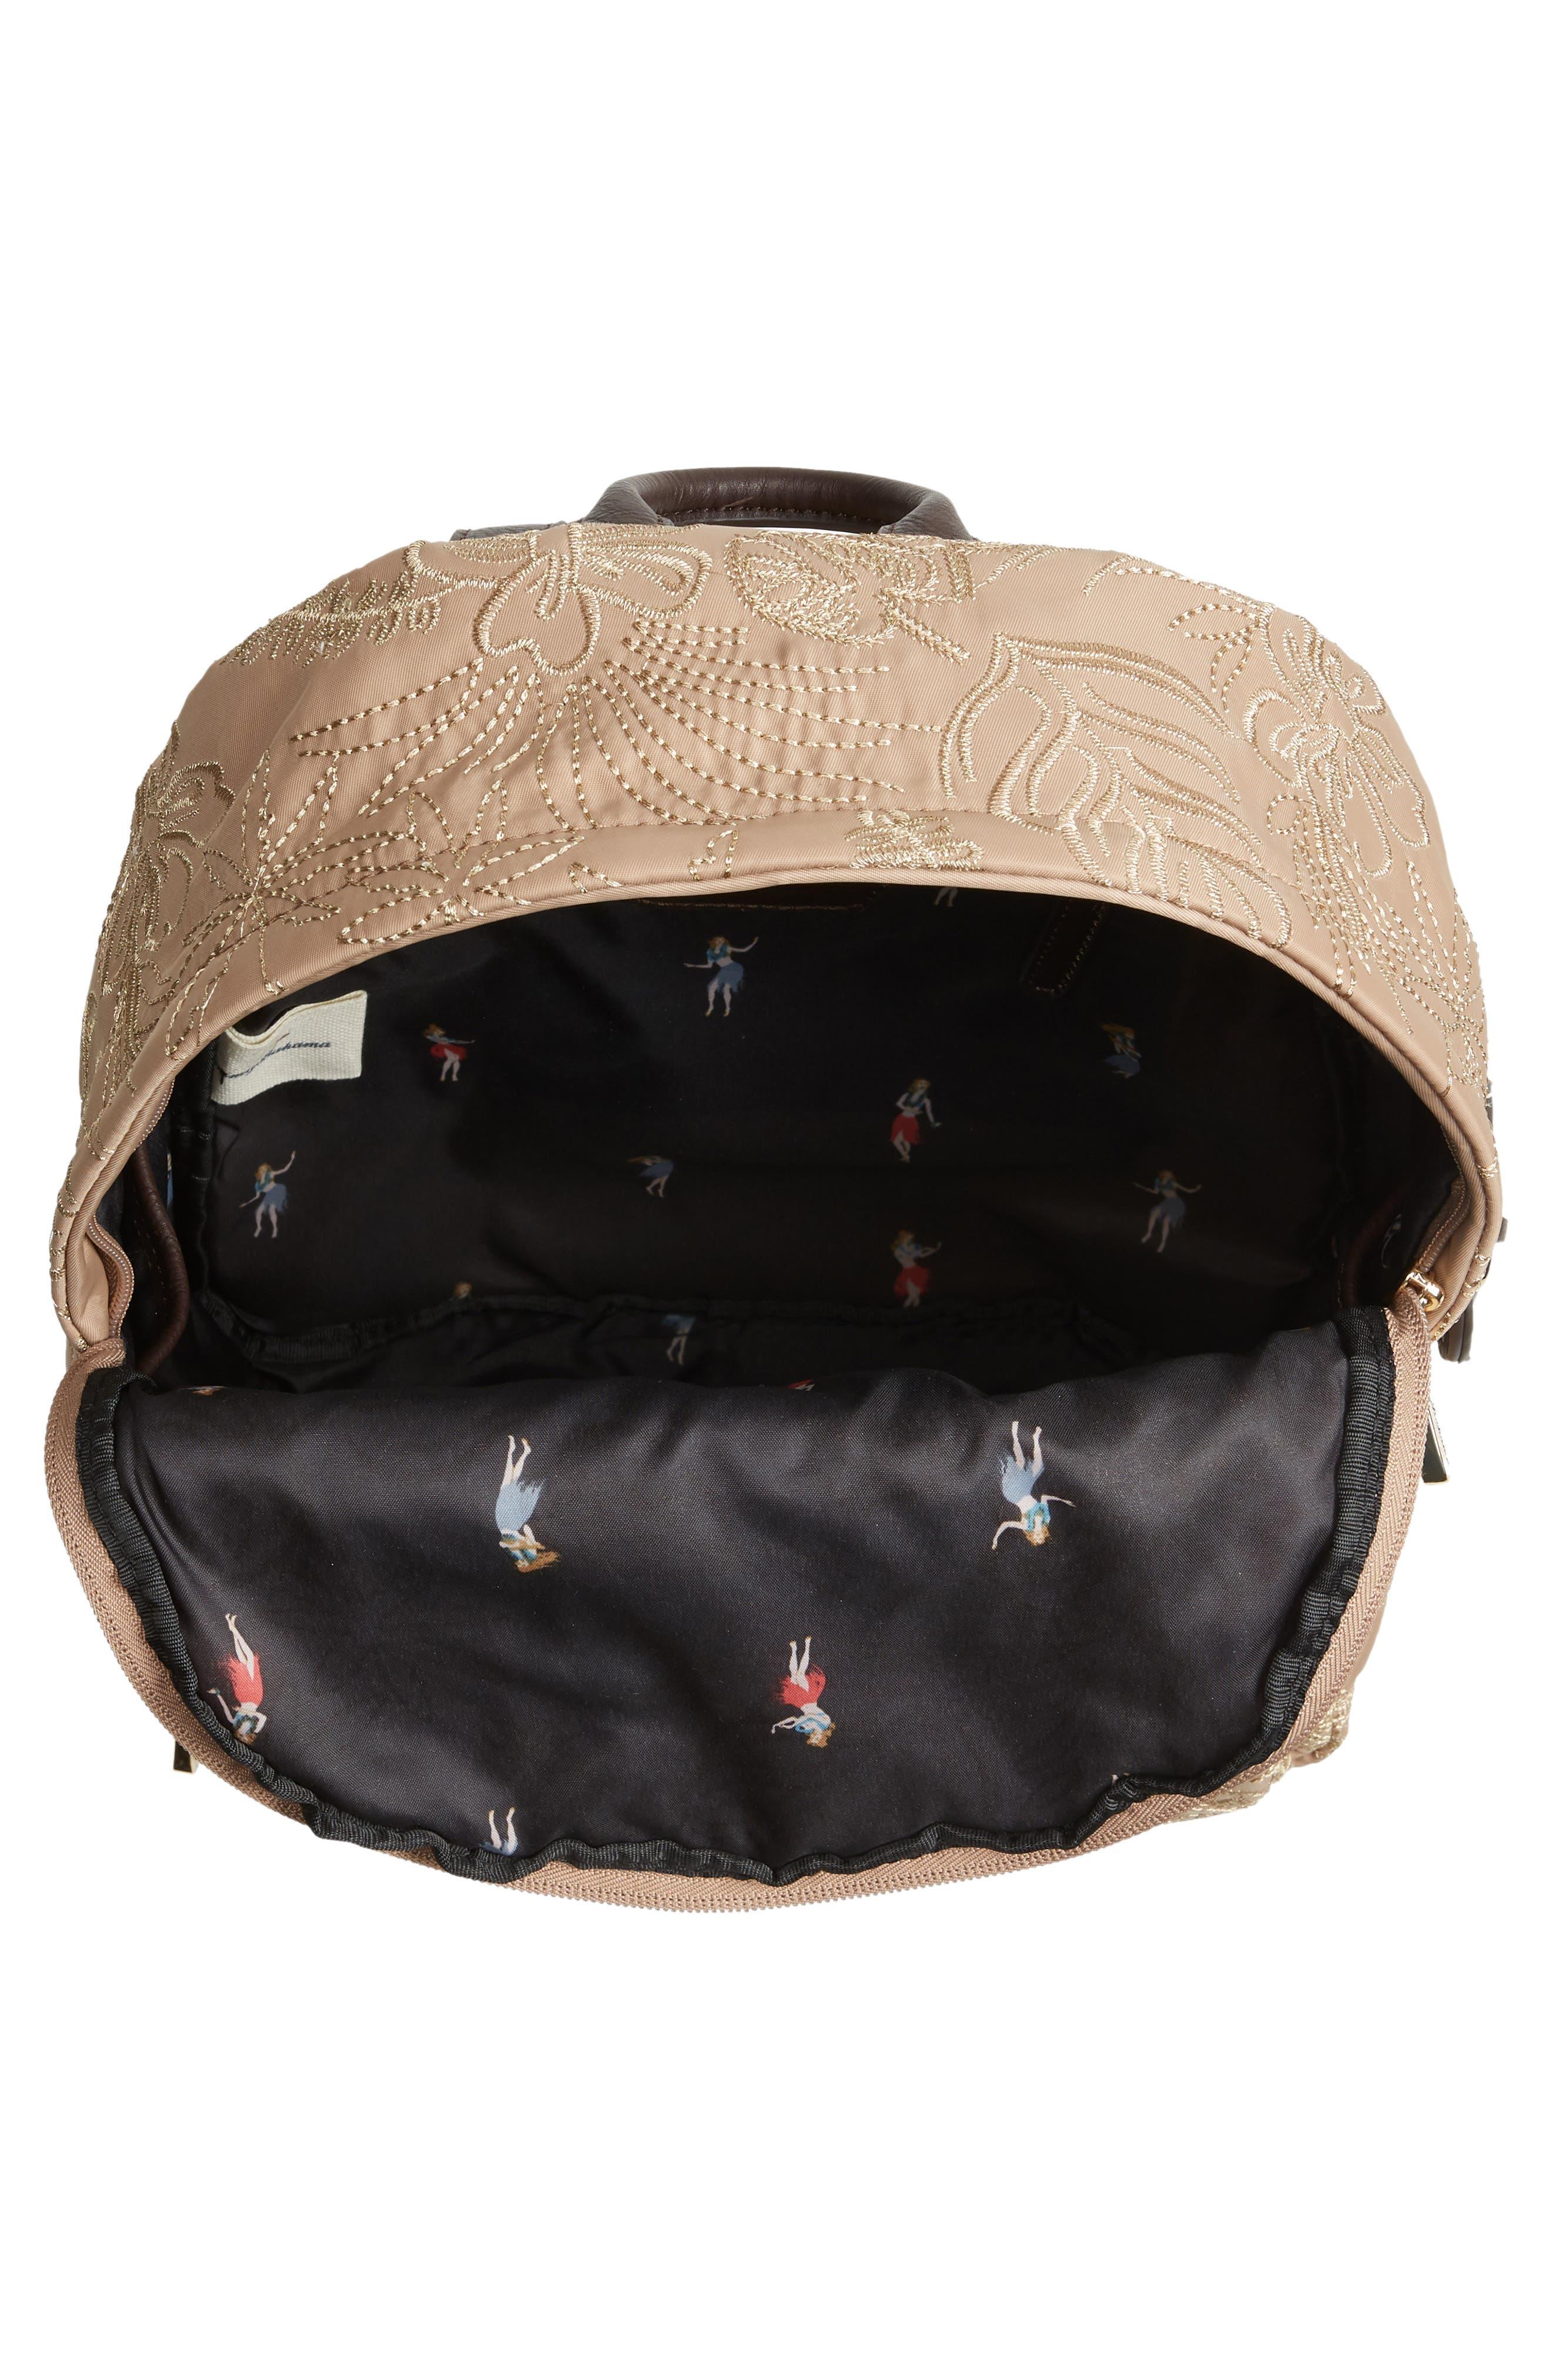 Siesta Key Backpack,                             Alternate thumbnail 4, color,                             230